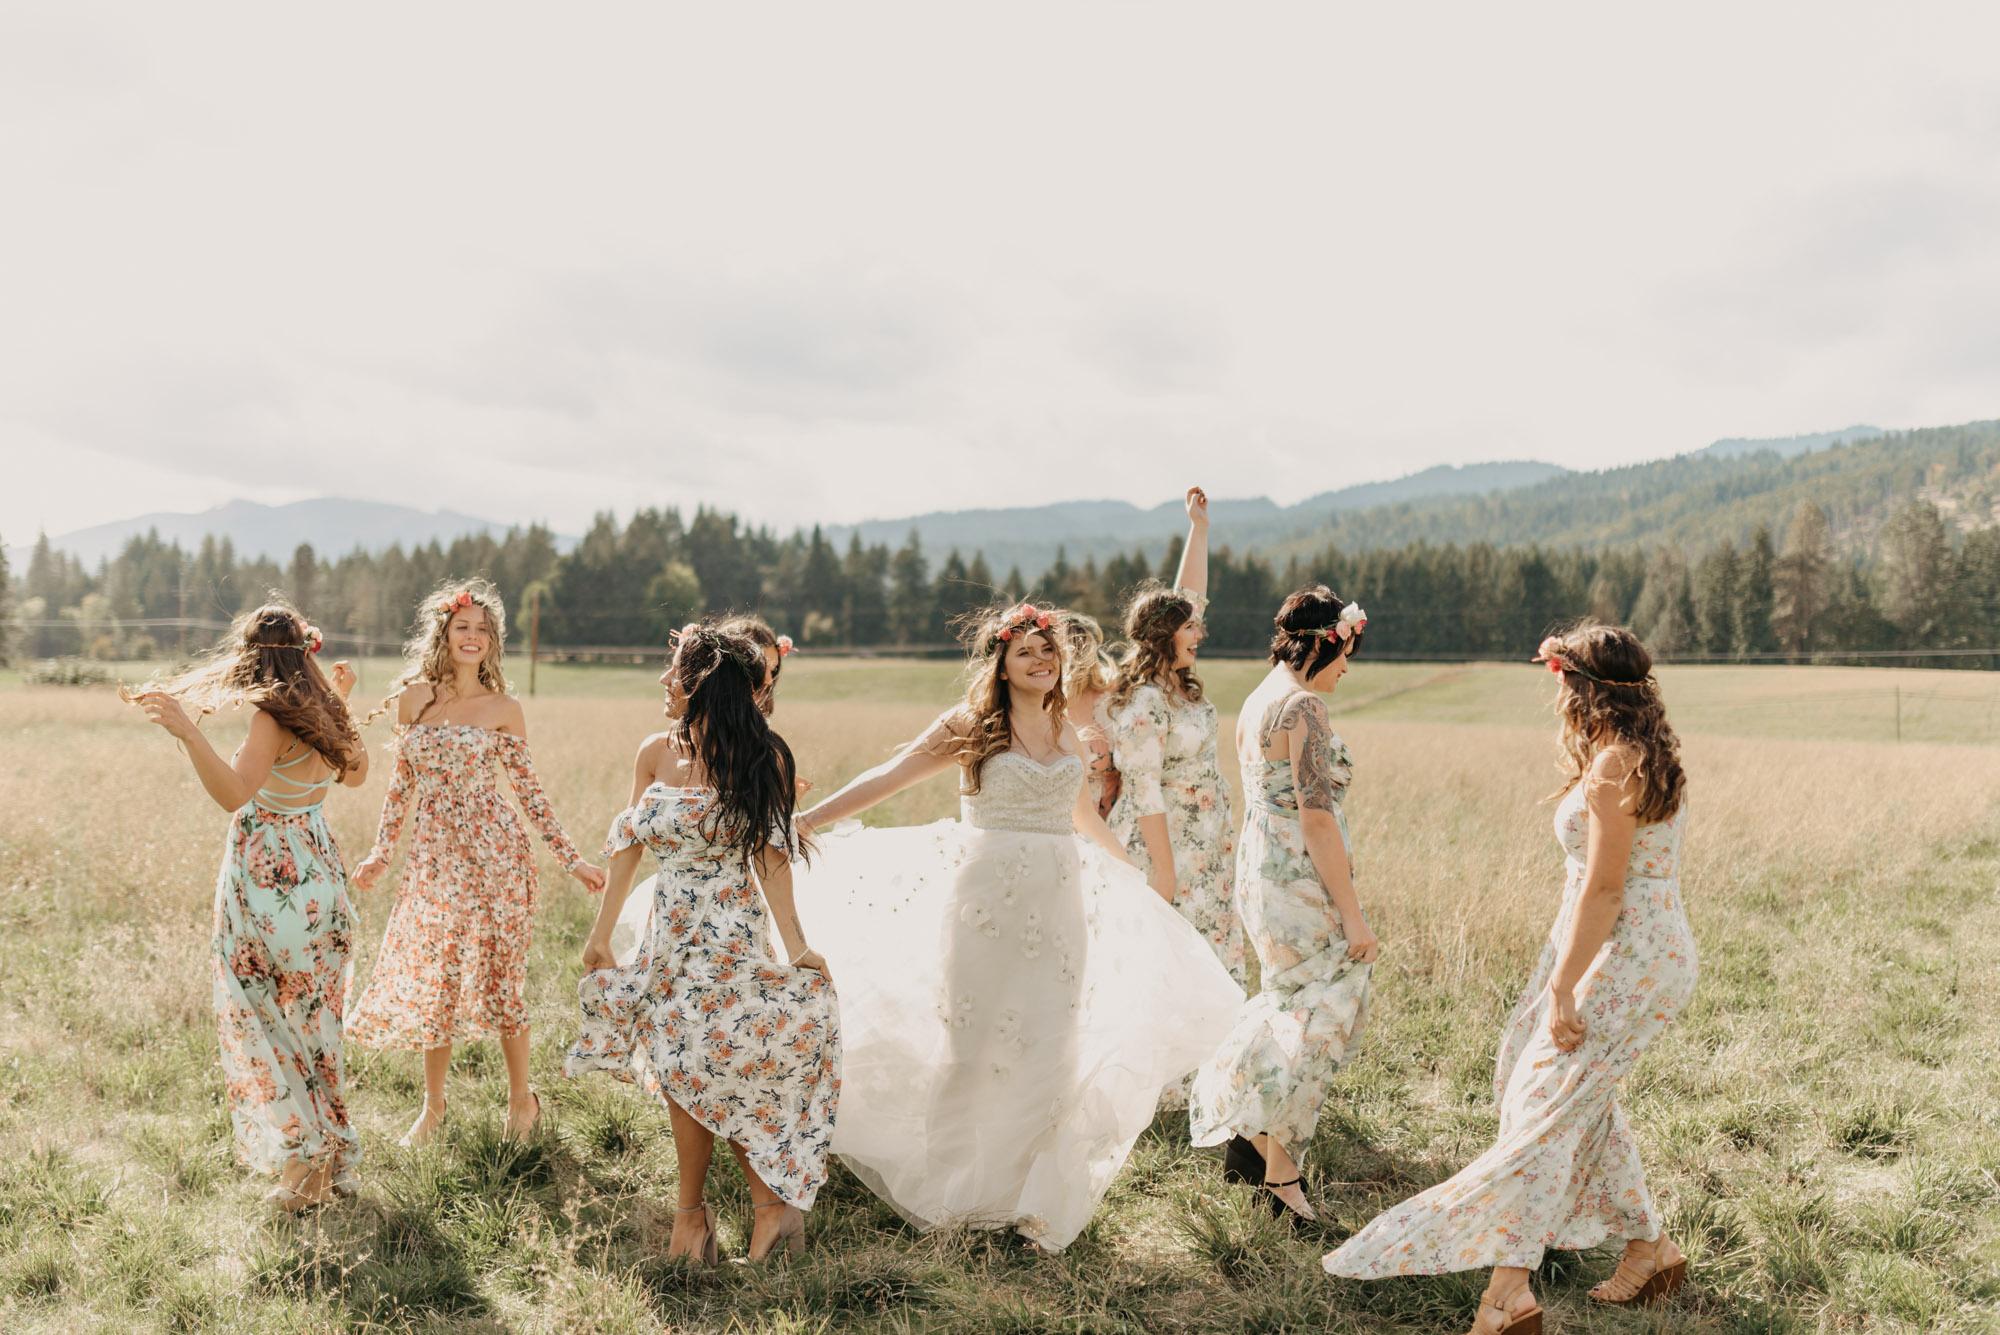 Bridal-Party-Free-People-Flower-Dresses-Washington-Wedding-8563.jpg